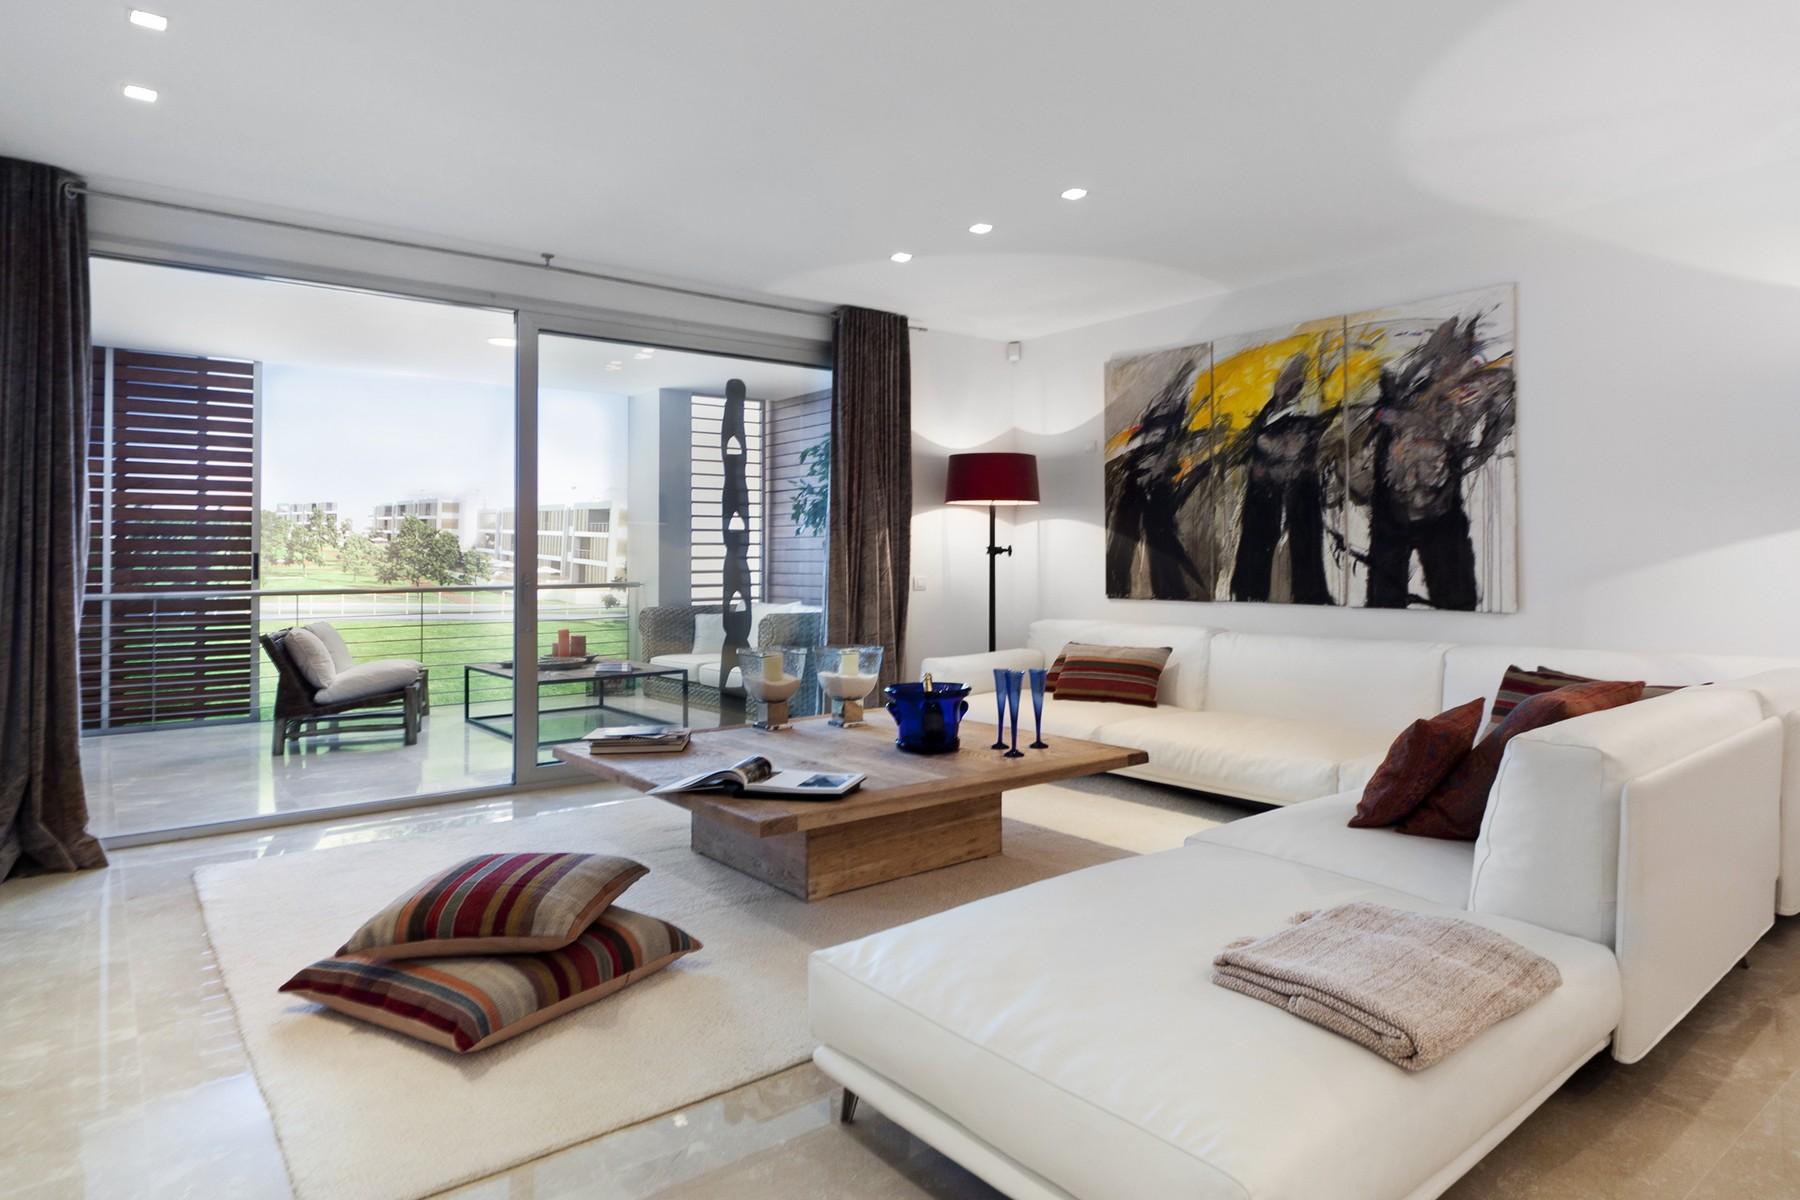 Single Family Home for Sale at Newly- built penthouse en Bendinat Palma, Mallorca, 07001 Spain